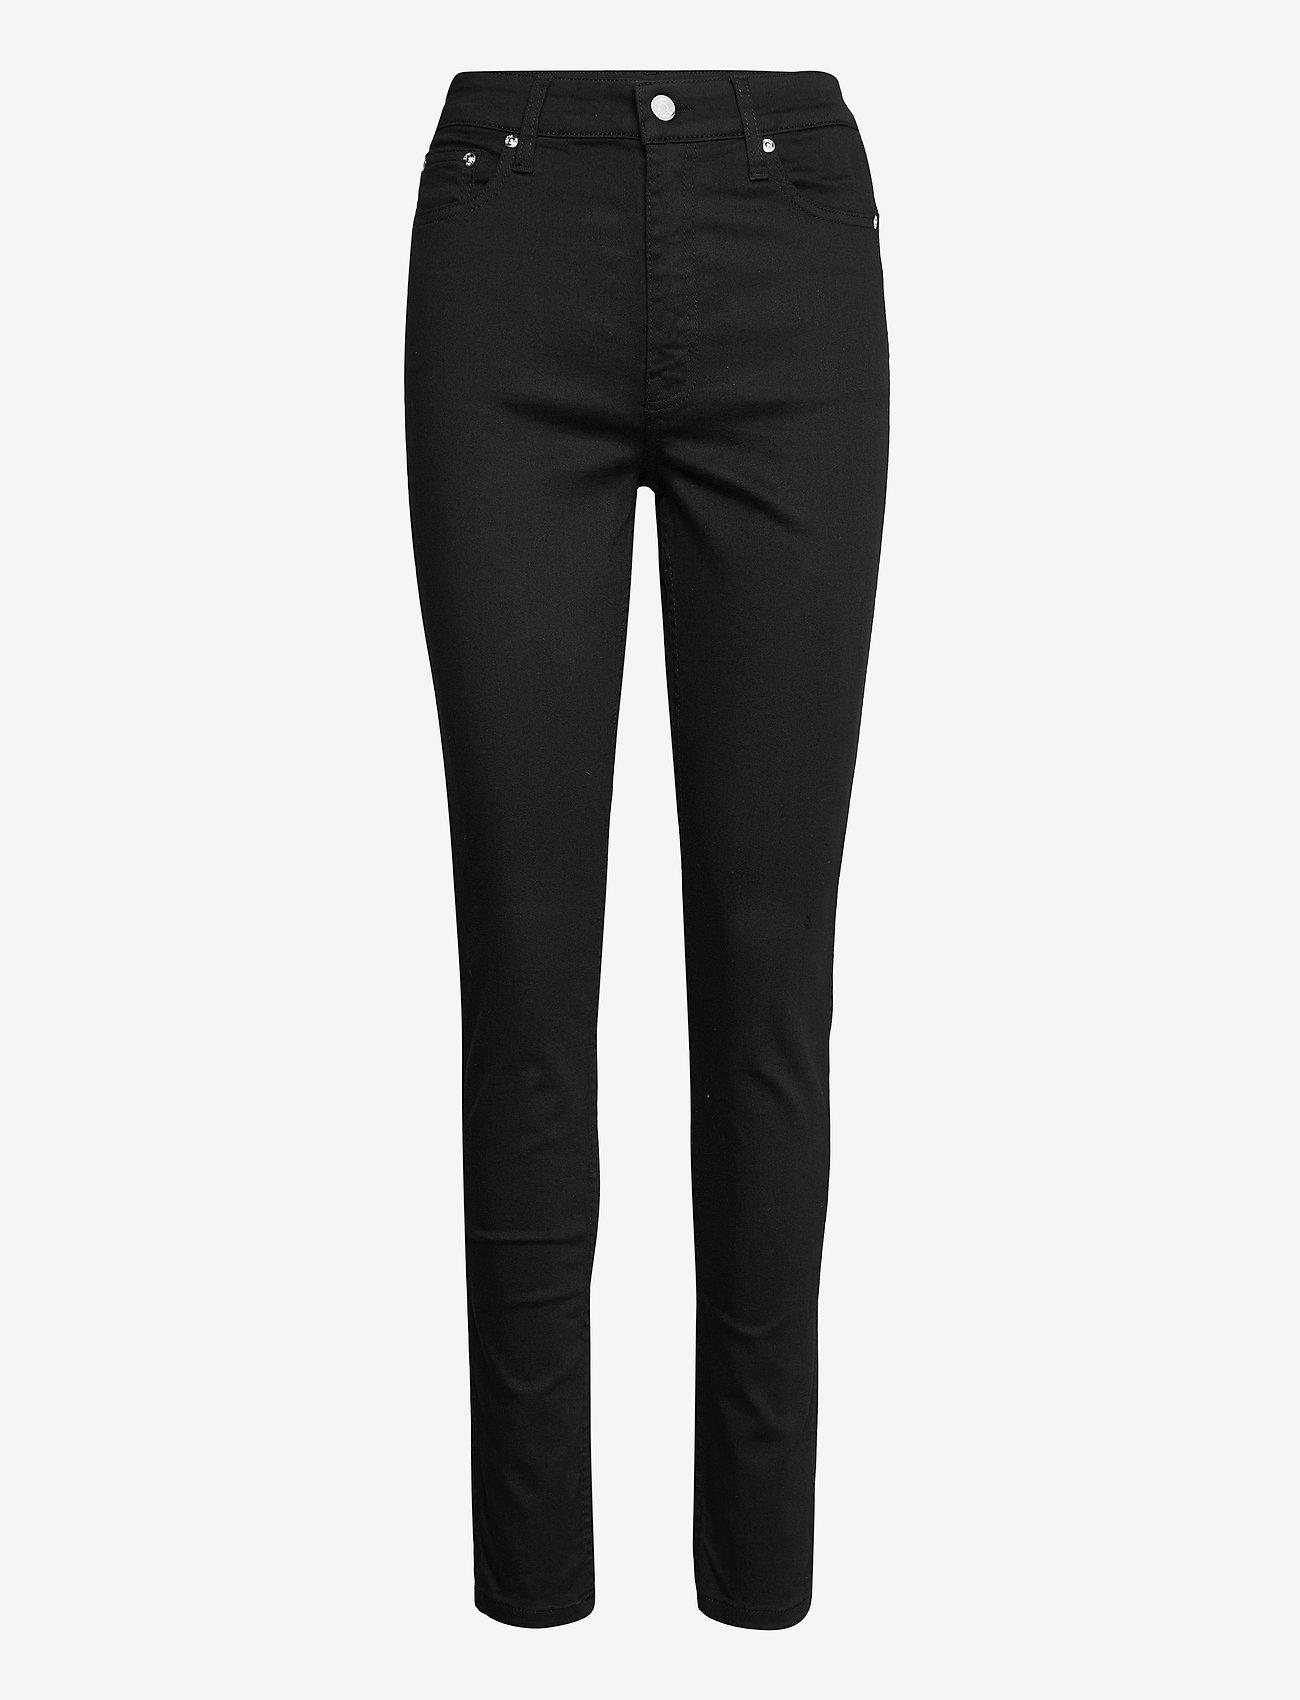 Gestuz - EmilyGZ HW skinny jeans black - skinny jeans - black - 1